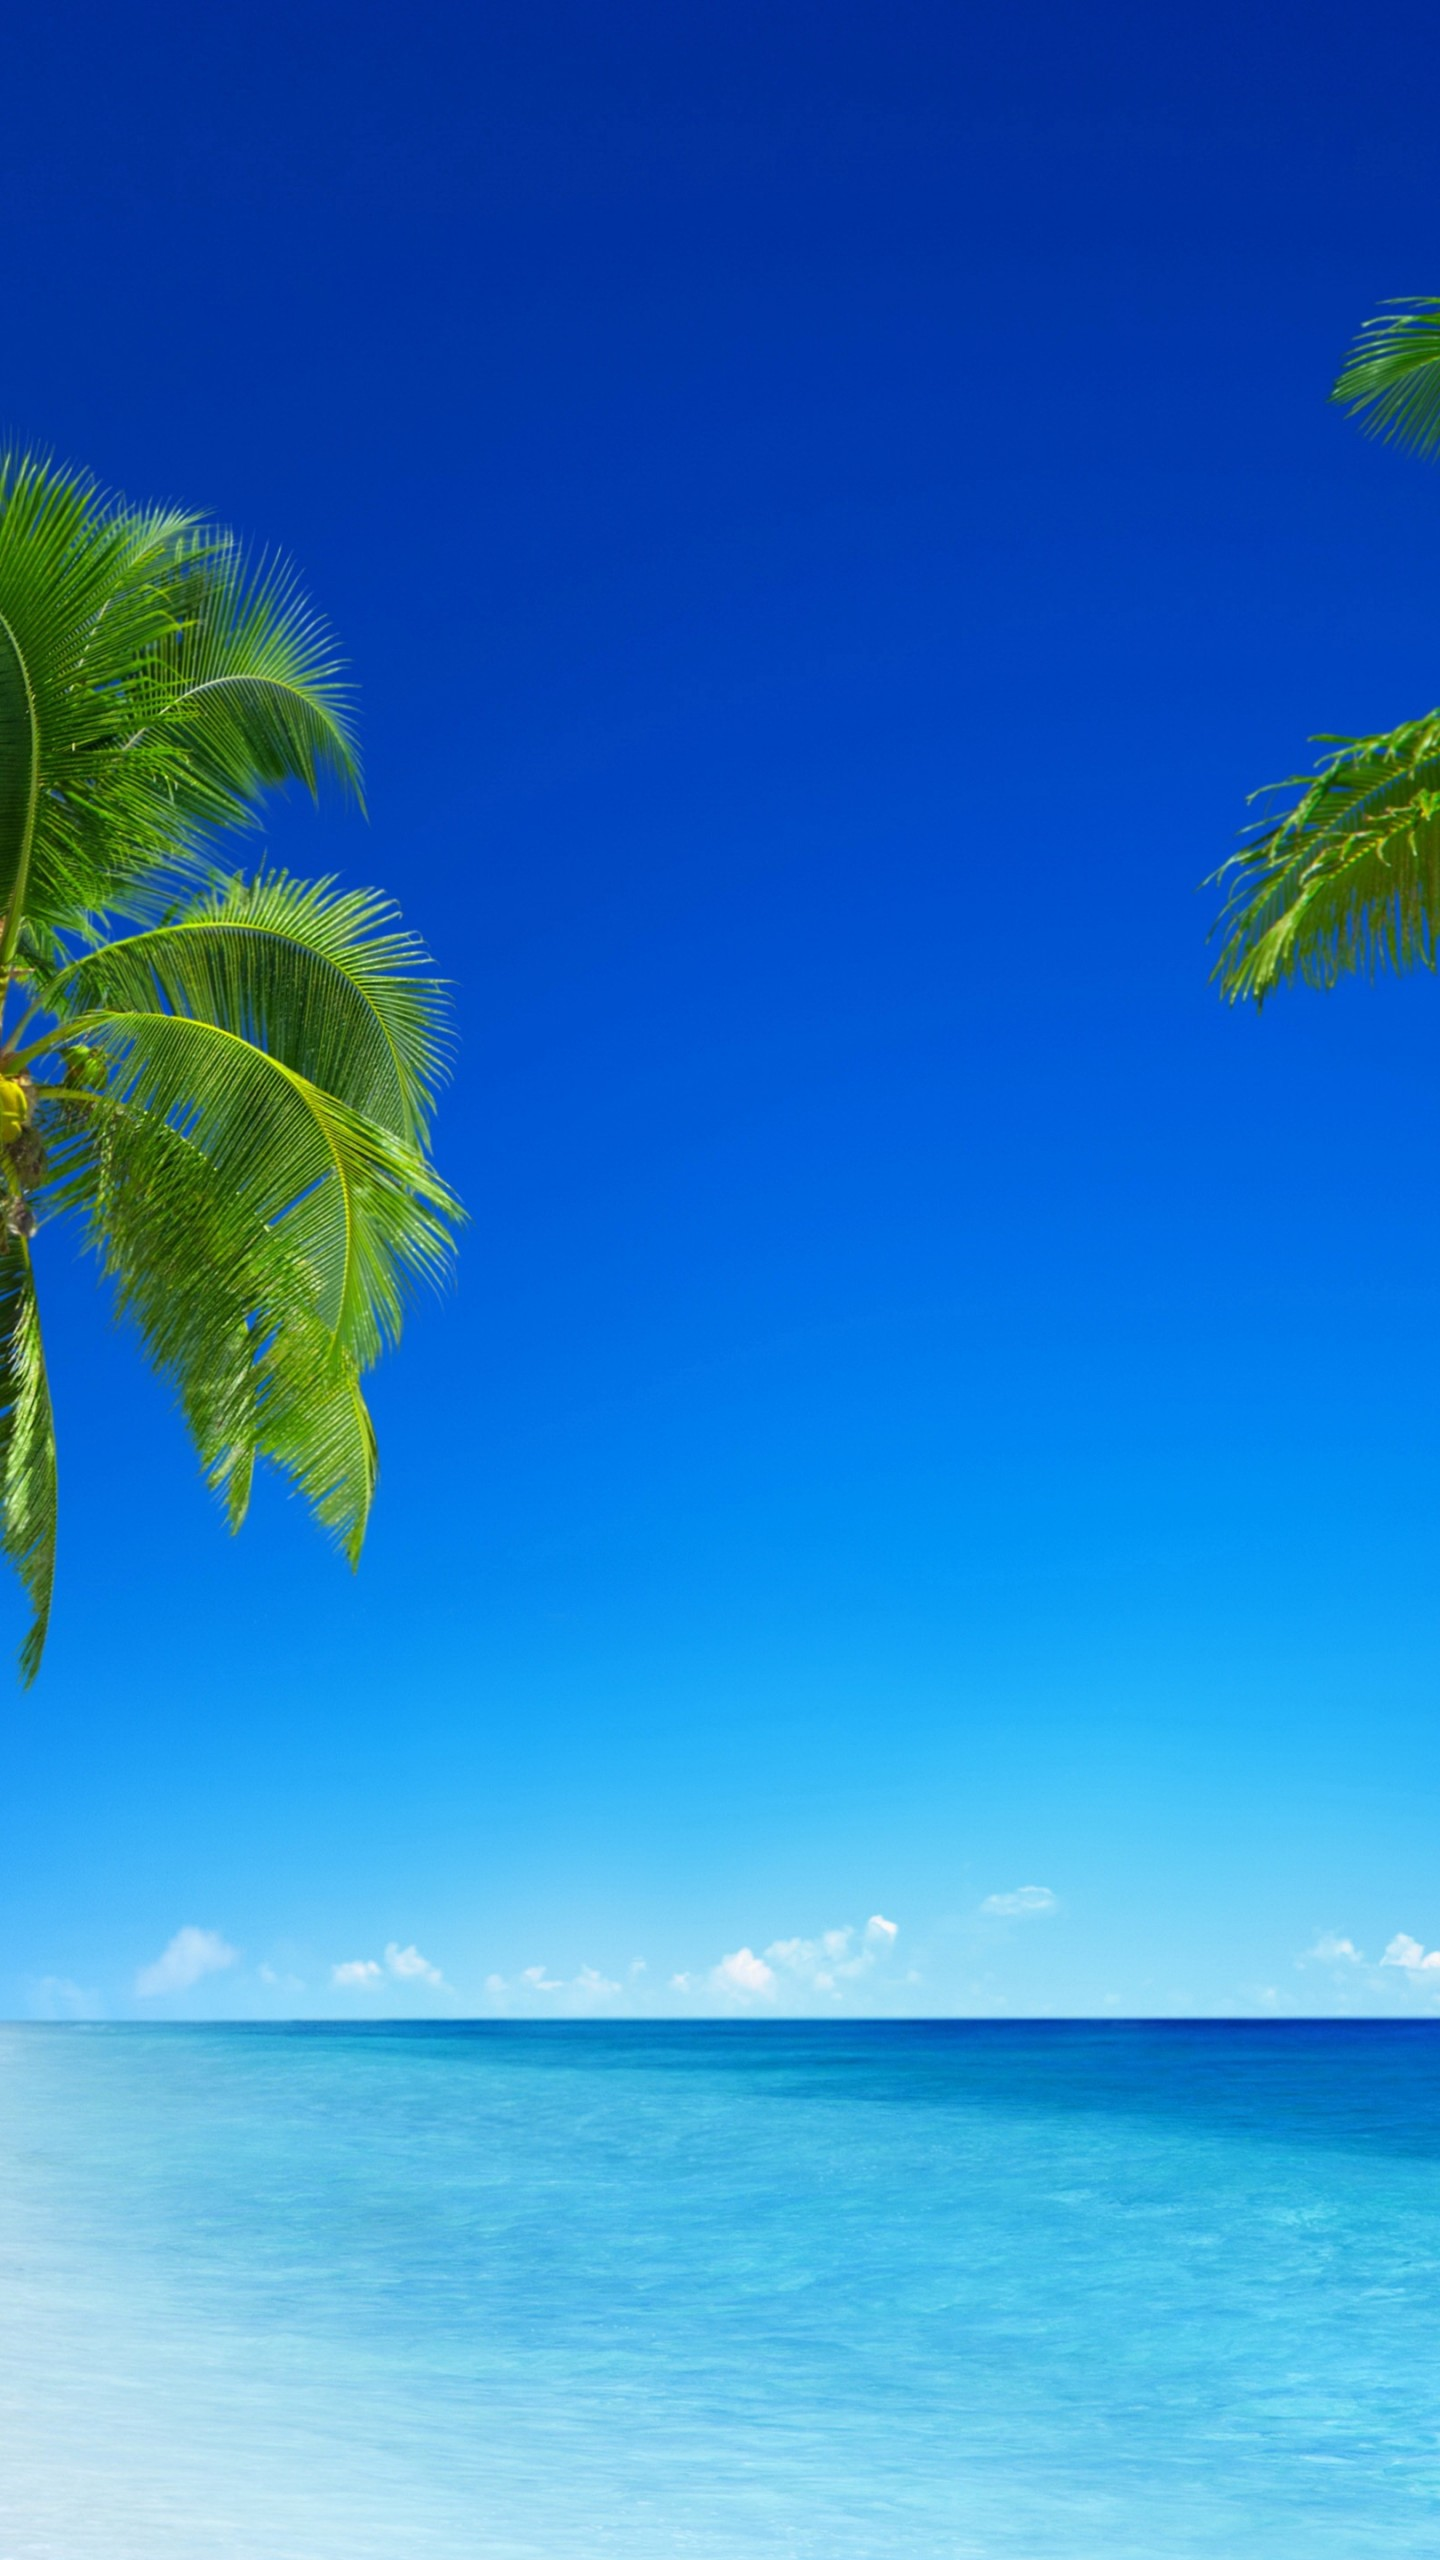 Wallpaper Tropical Beach 5k 4k Wallpaper 8k Paradise